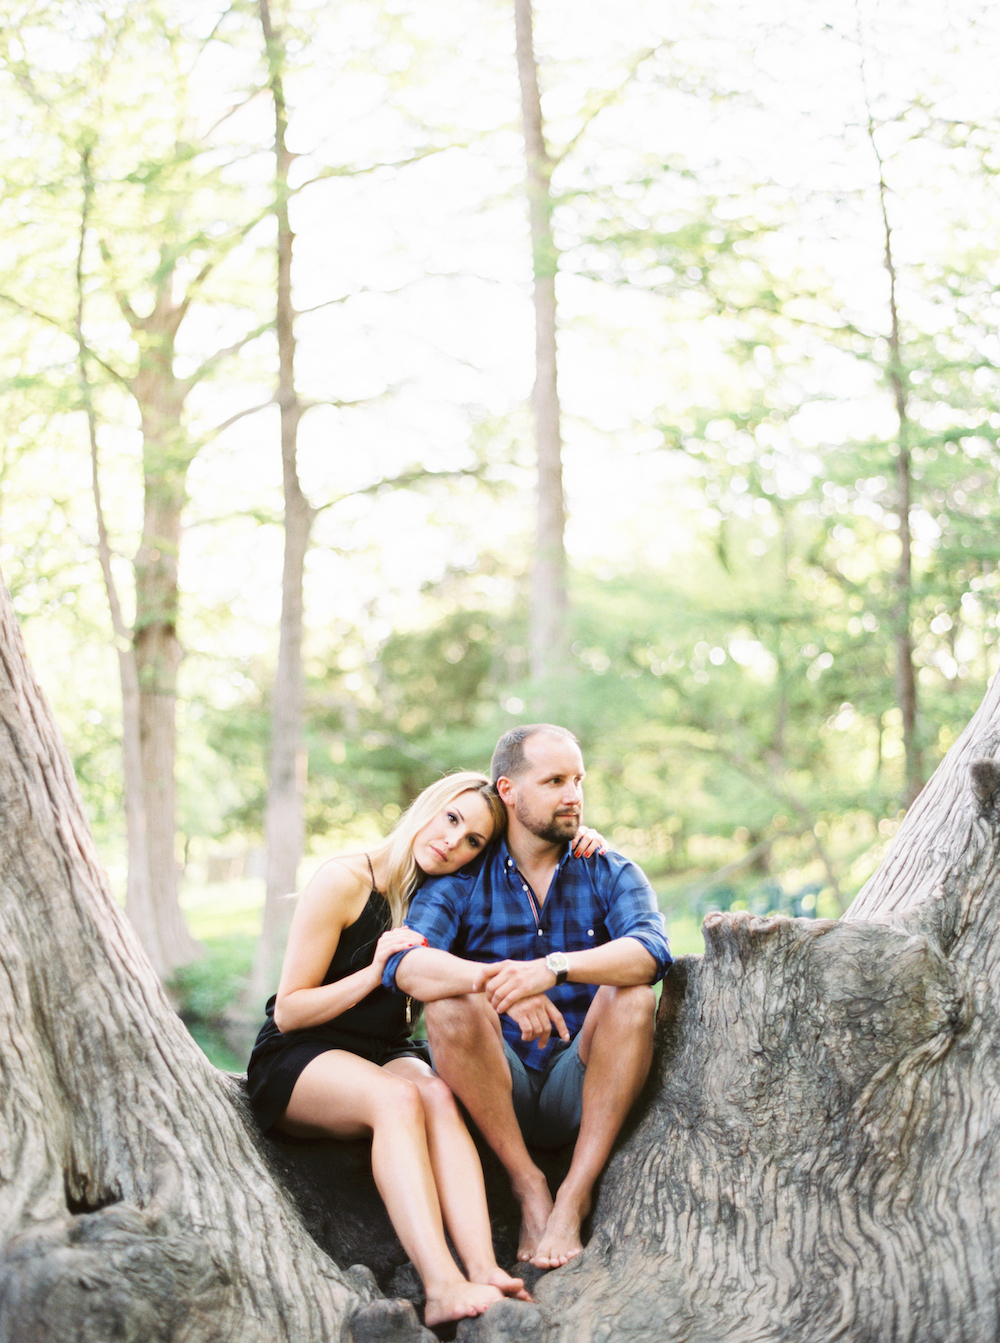 Blue Hole Engagement Session - Jessica Scott Photography